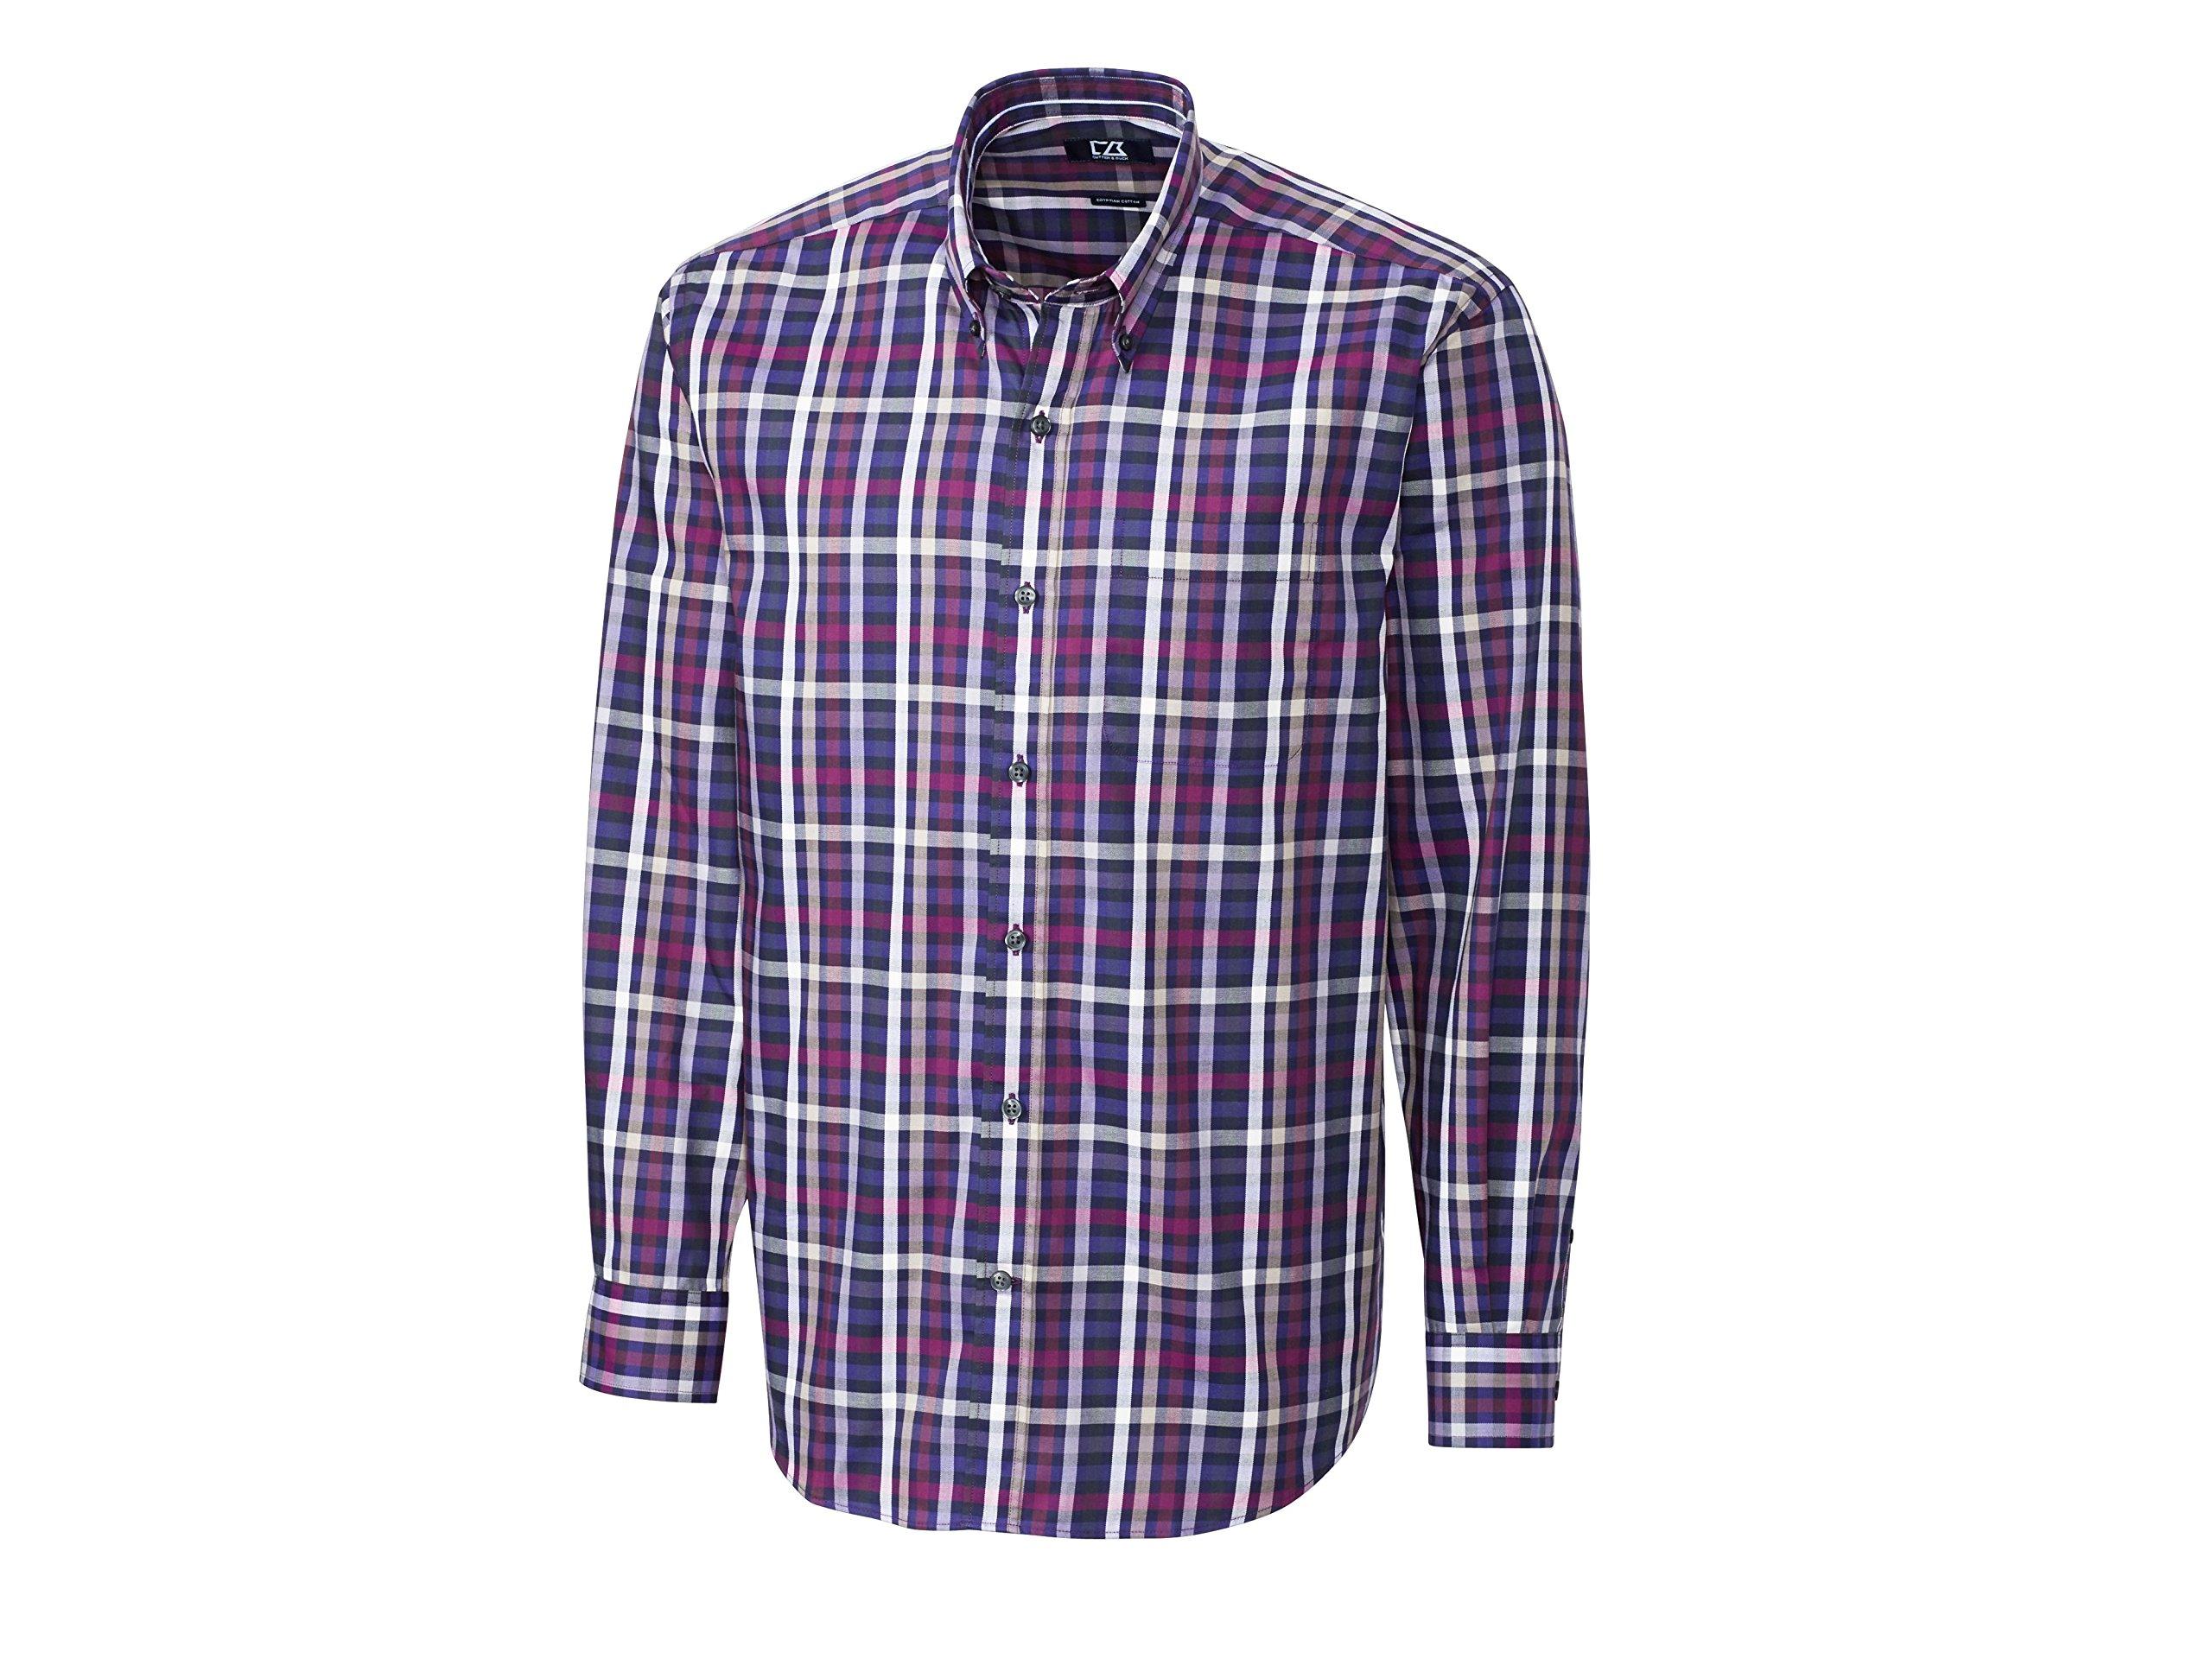 Cutter & Buck Men's Big-Tall Long Sleeve Hill Climb Plaid Woven Shirt, Multi, 2X/Big